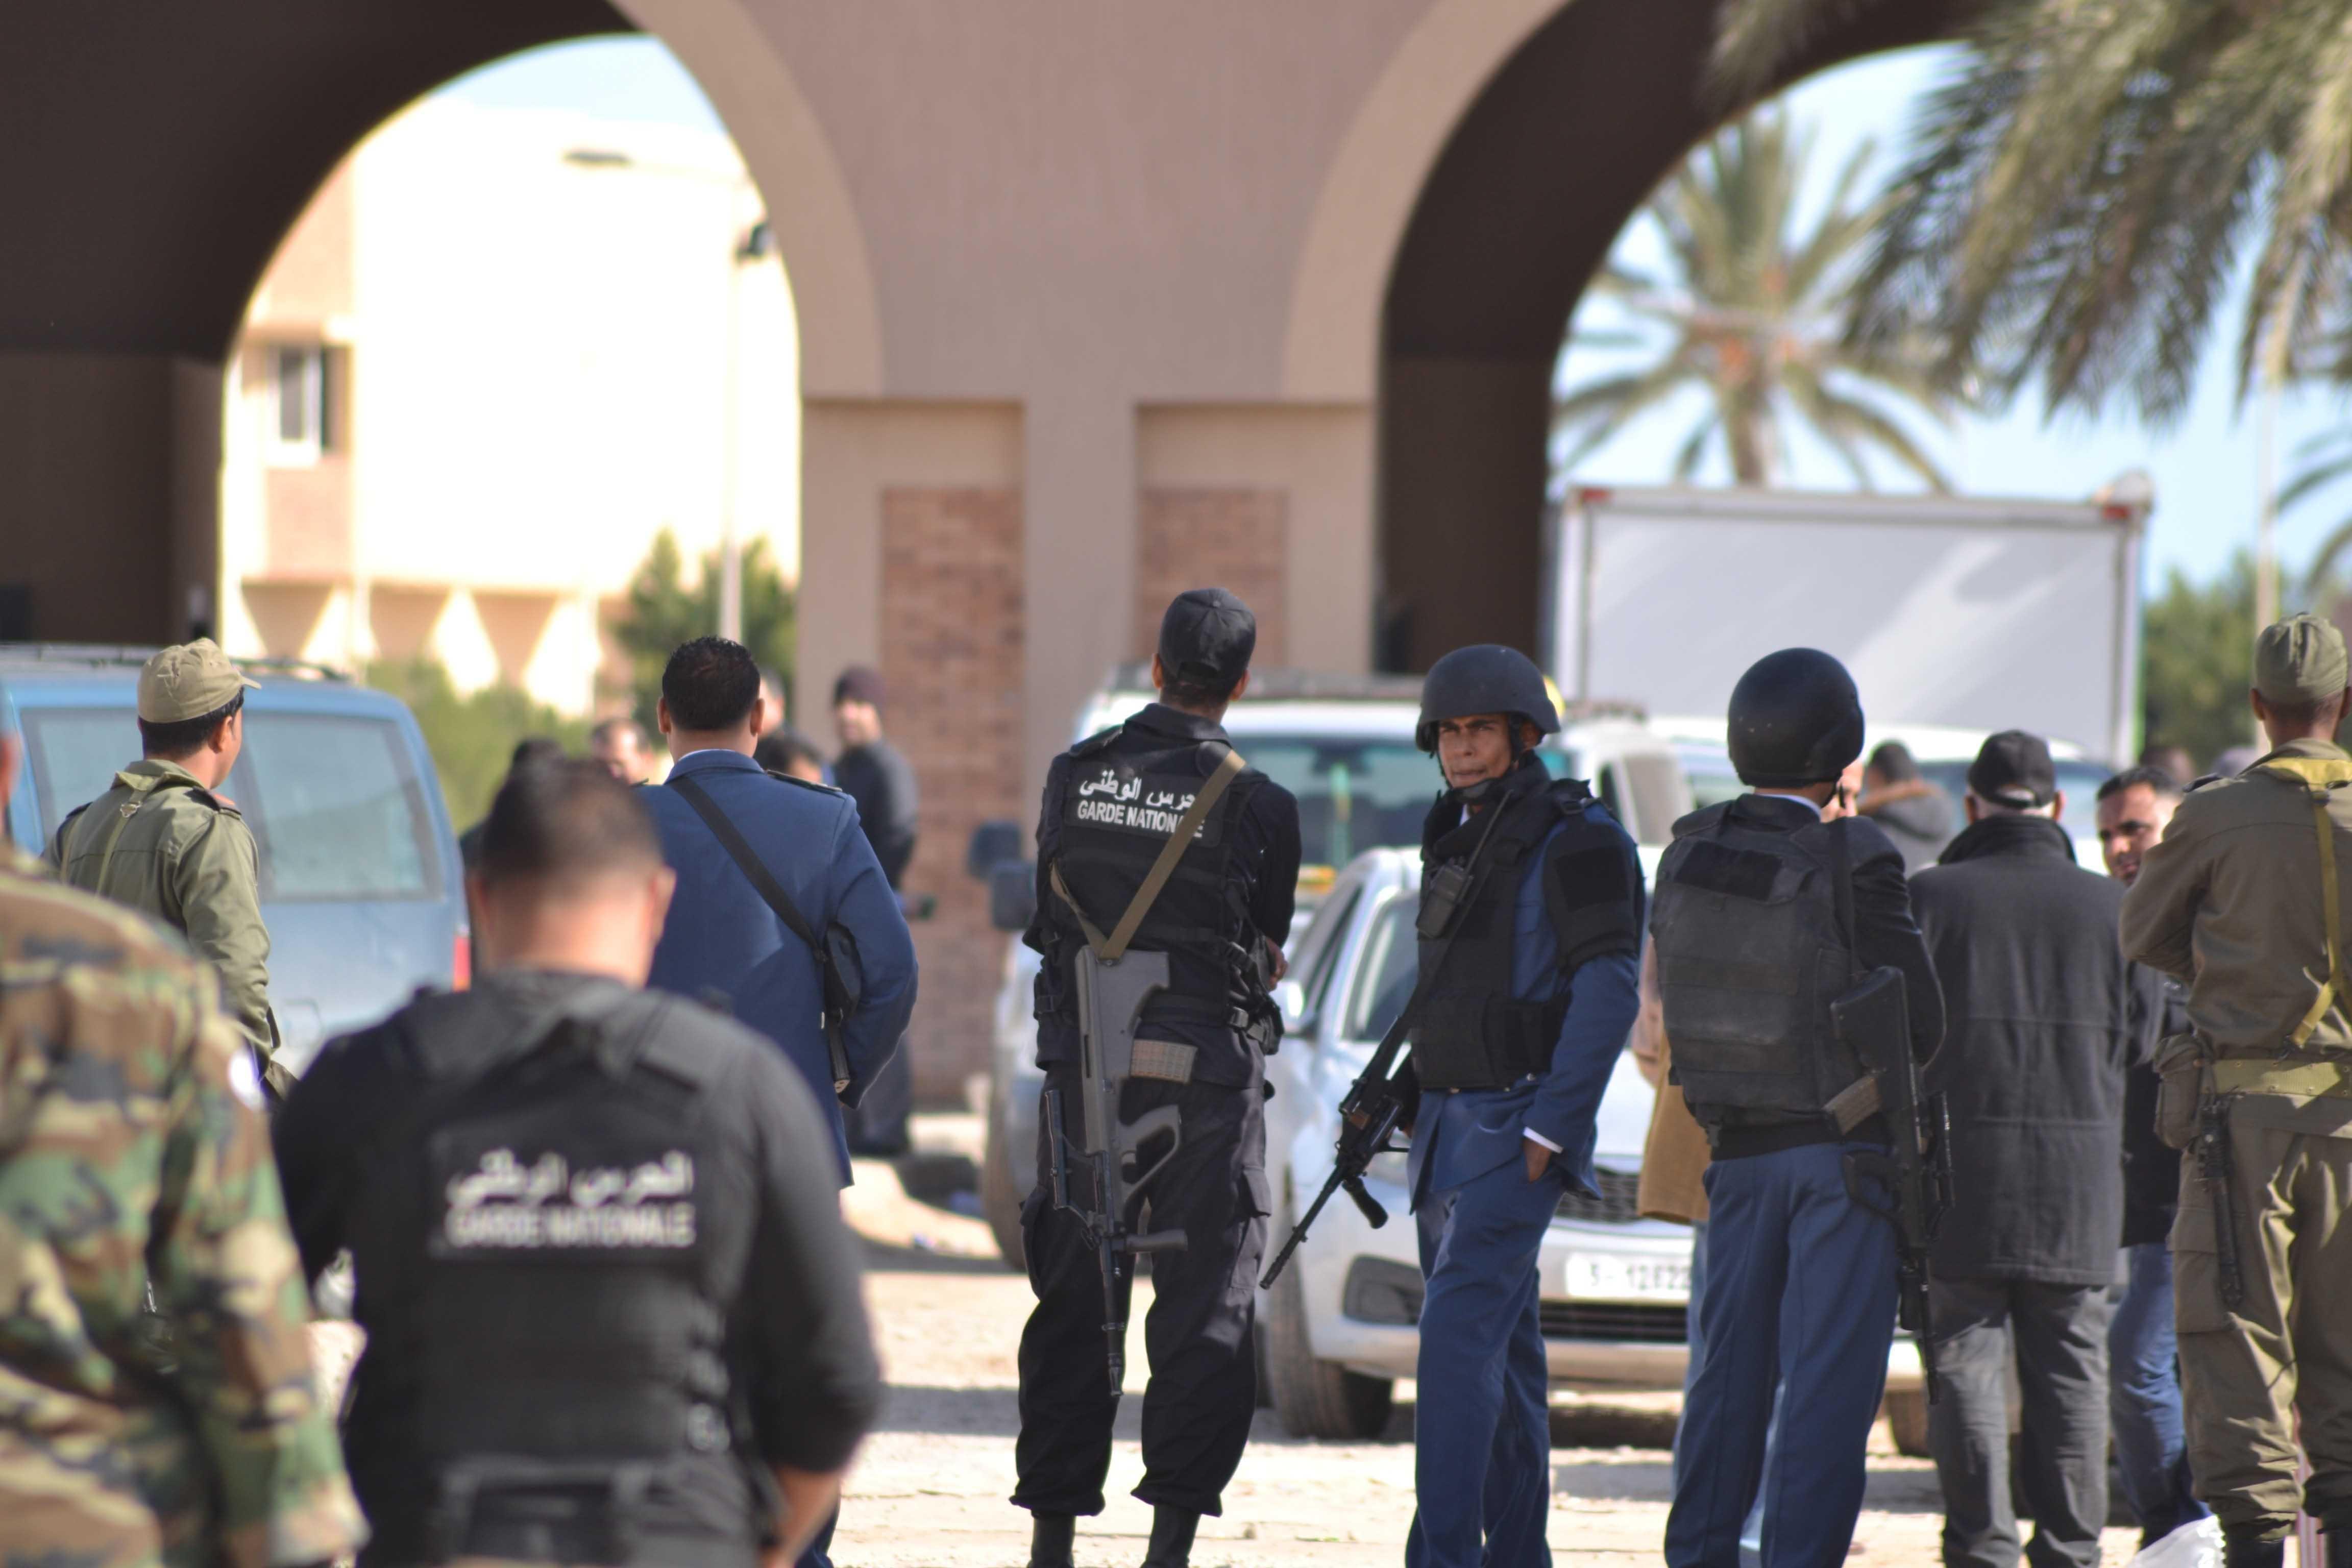 Ras Jedir border gate of Tunisia is closed off